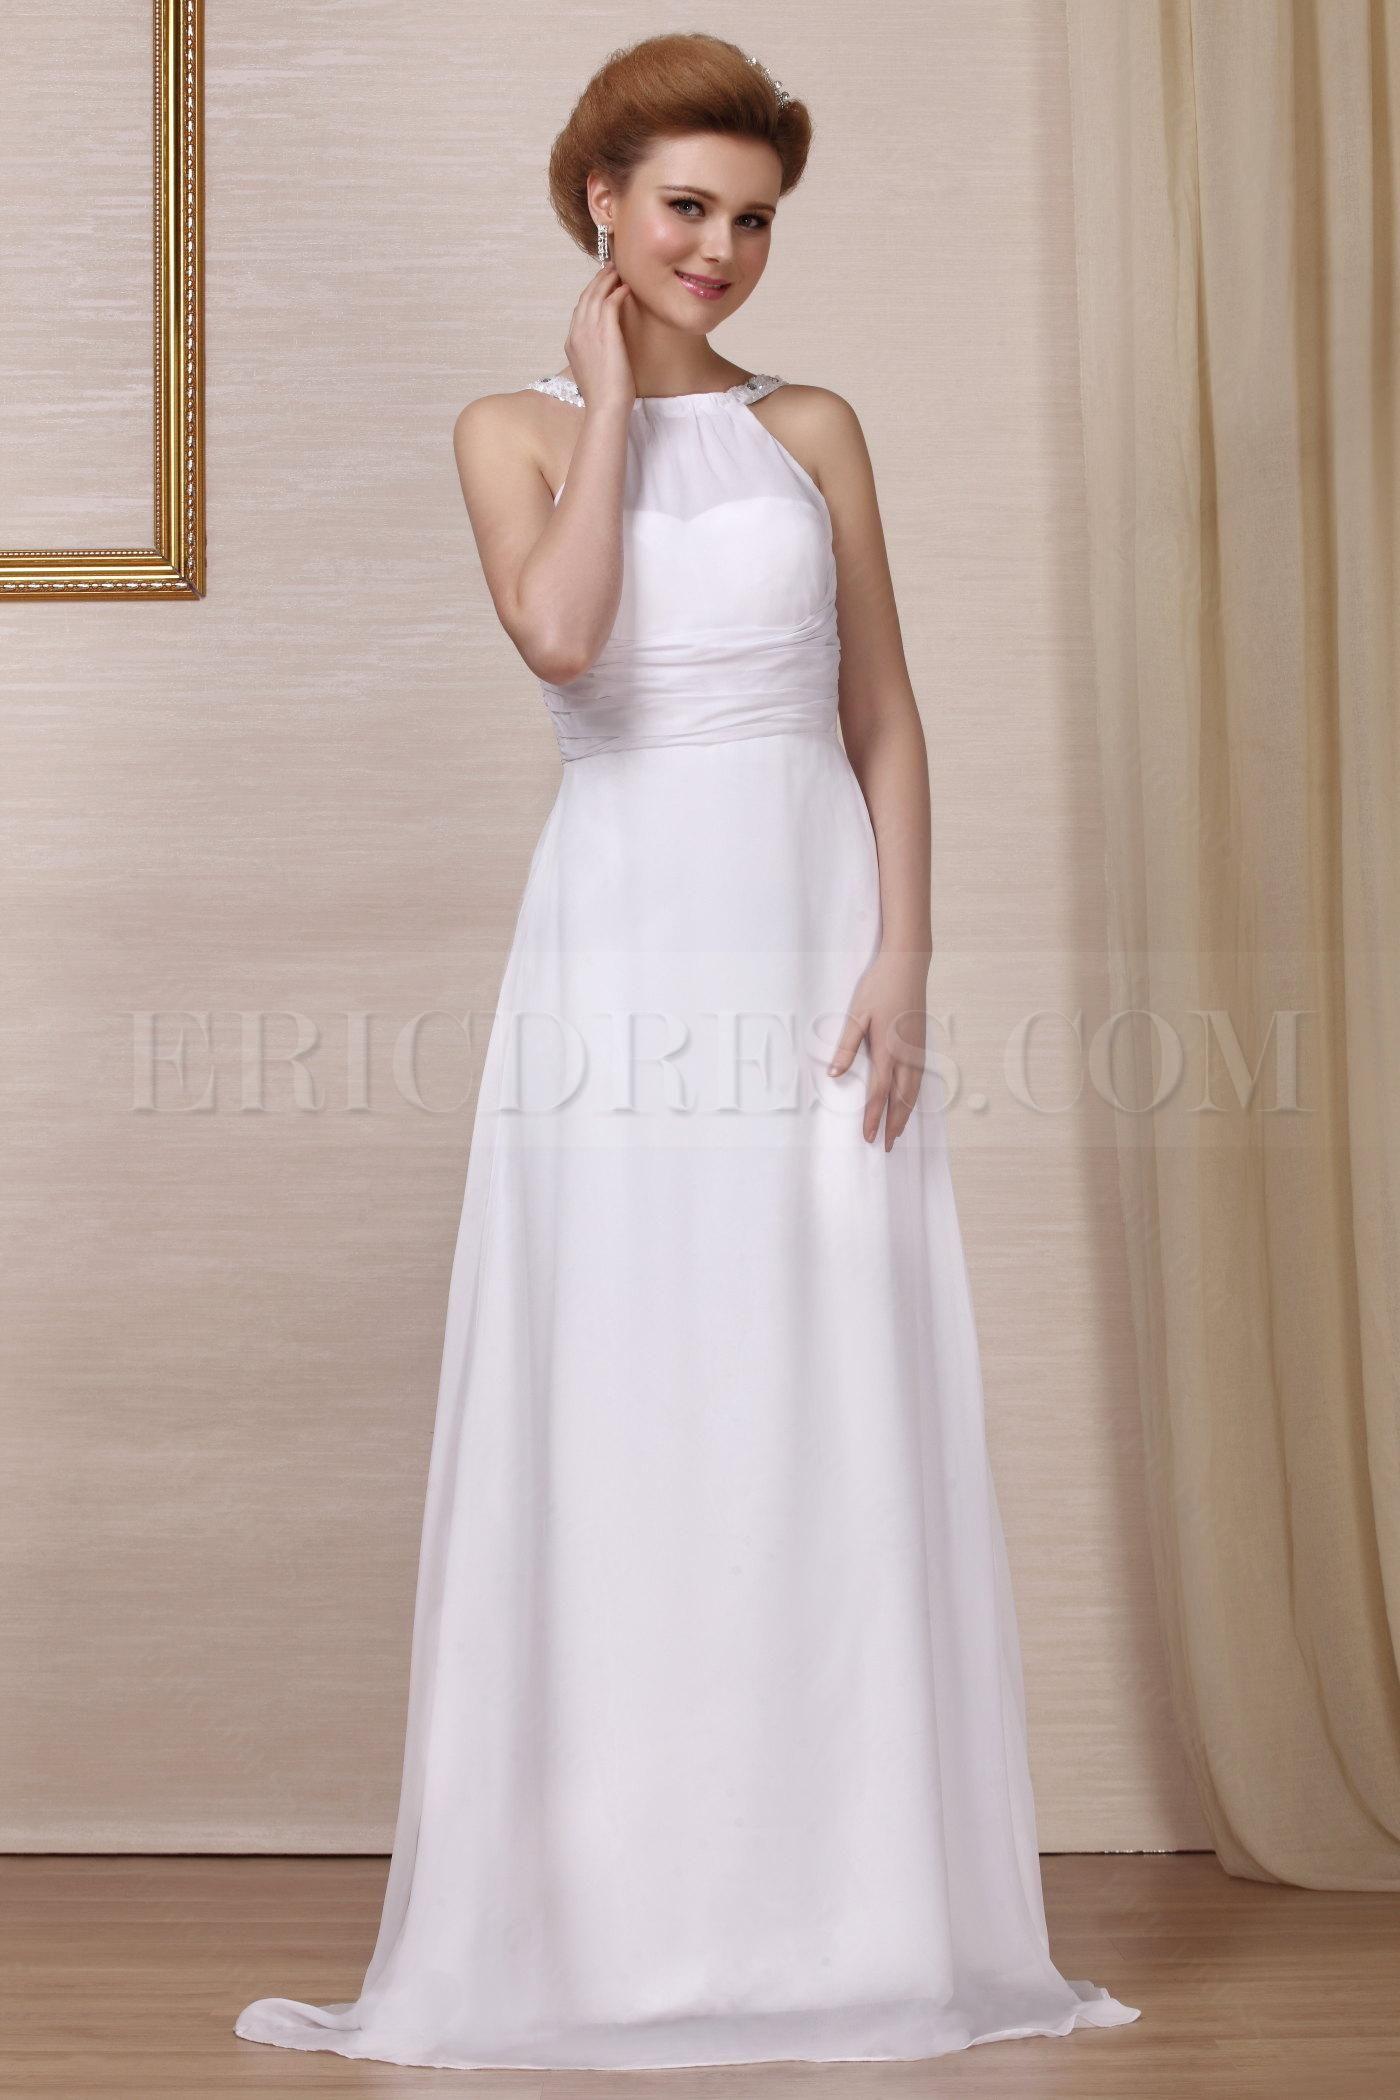 Beach wedding party dresses  Simple HighNeck Aline Floorlength Beach Wedding Dresses  lace